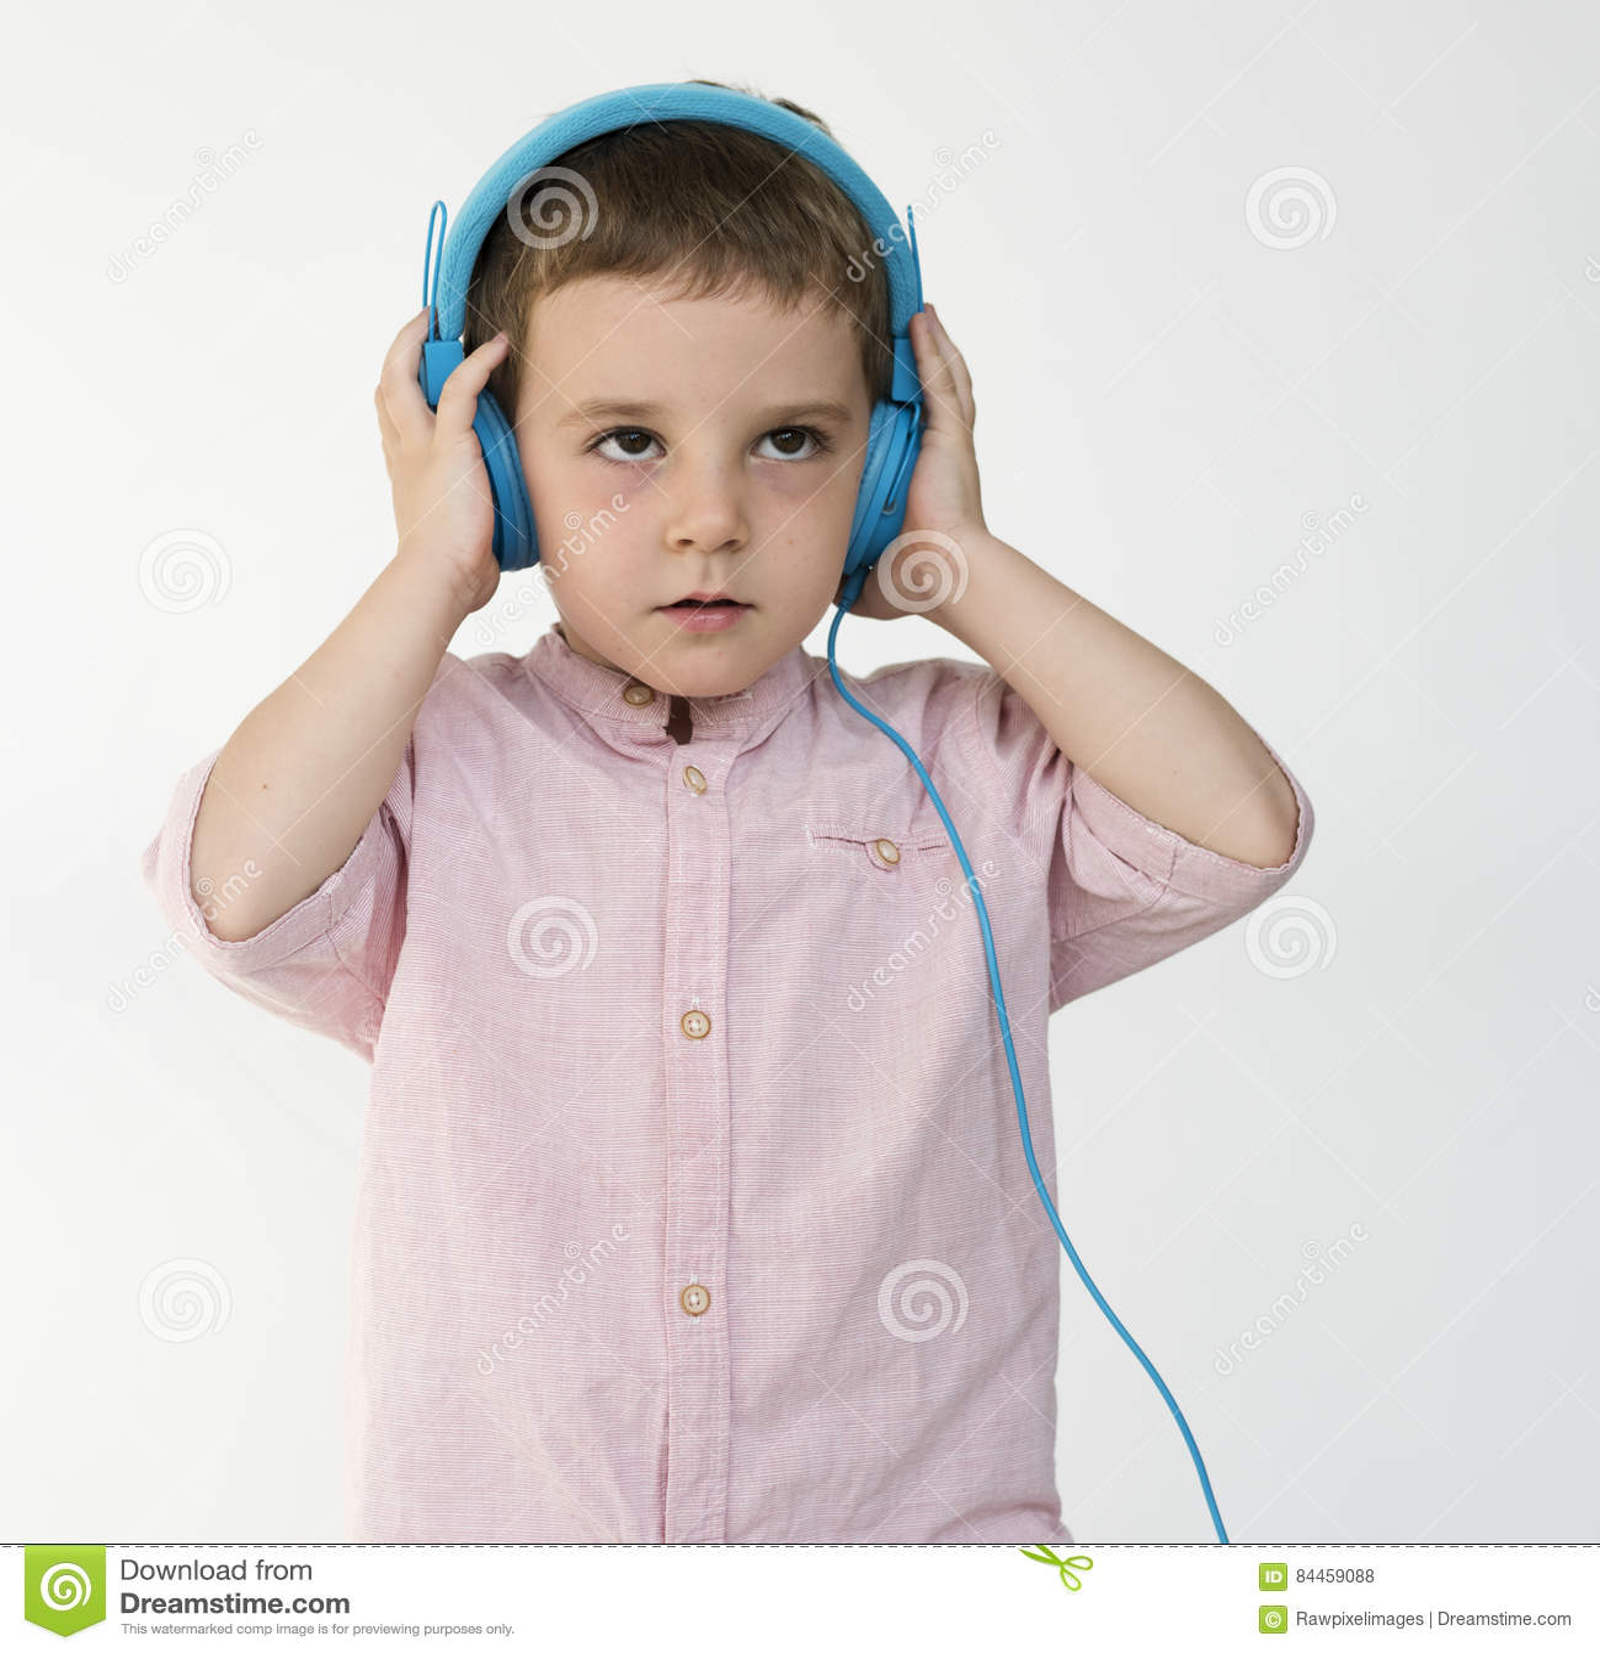 Children Listening Music Song Headphones Concept